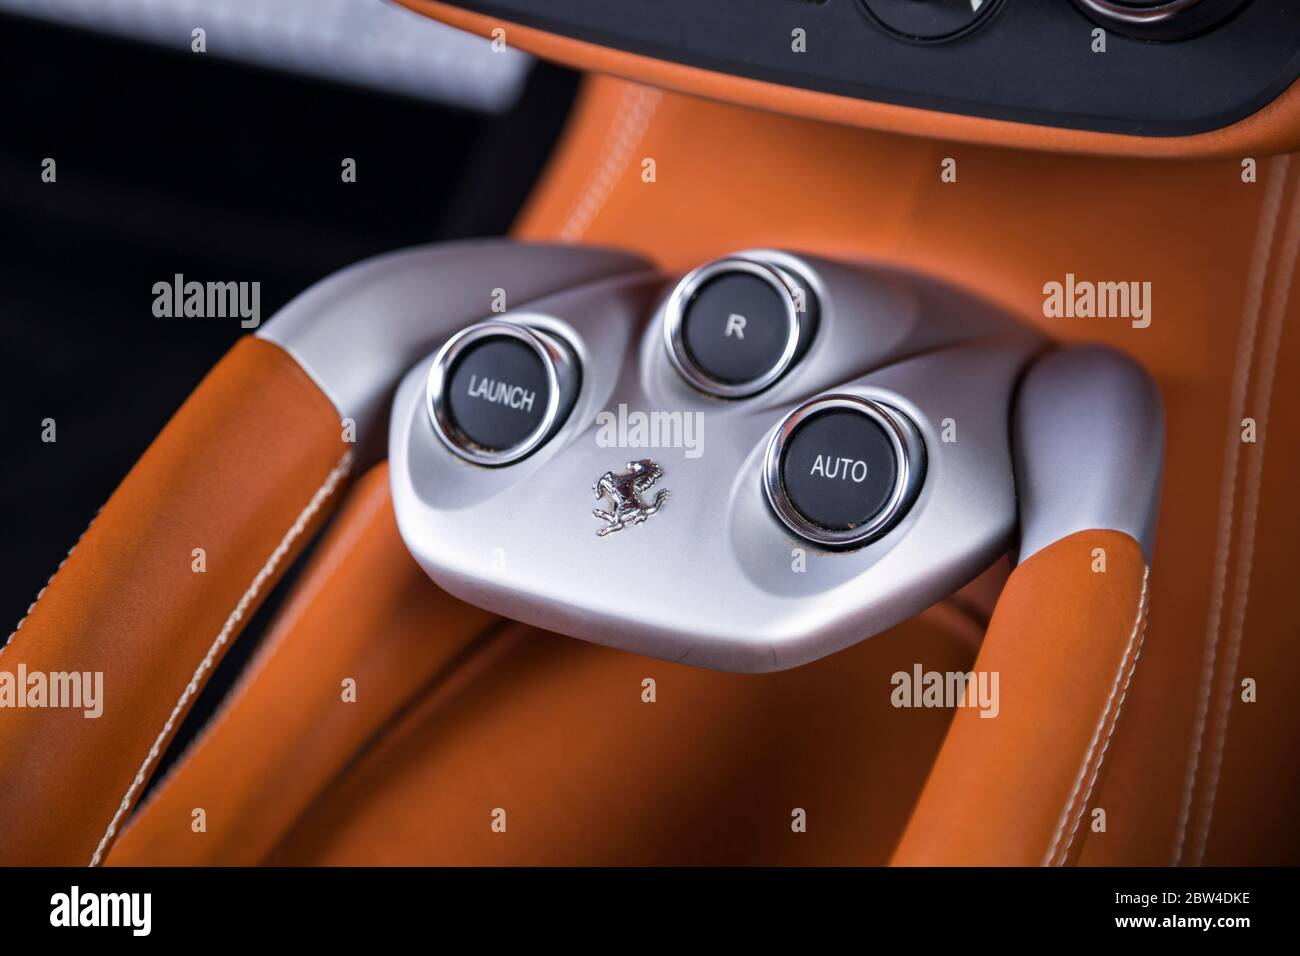 Ferrari Automatic Transmission Buttons Stock Photo Alamy